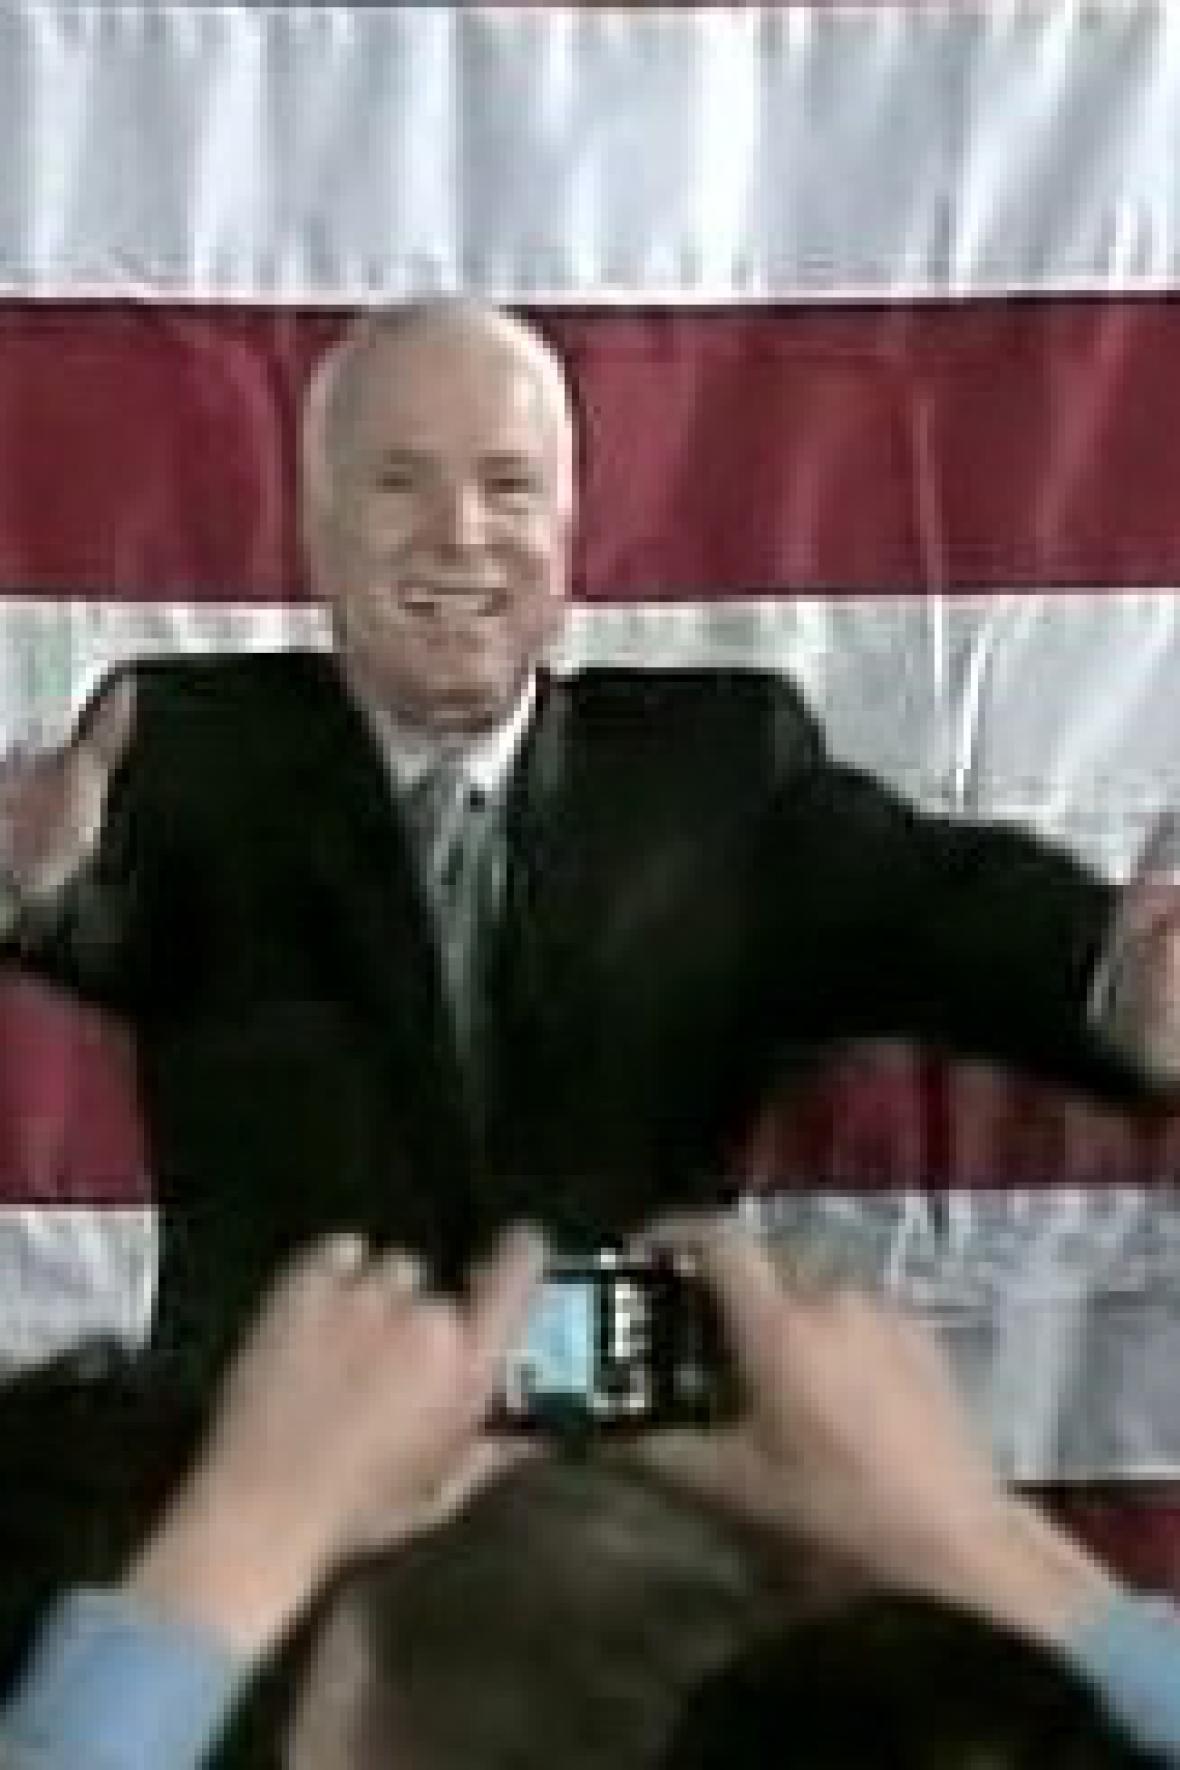 Vítěz John McCain